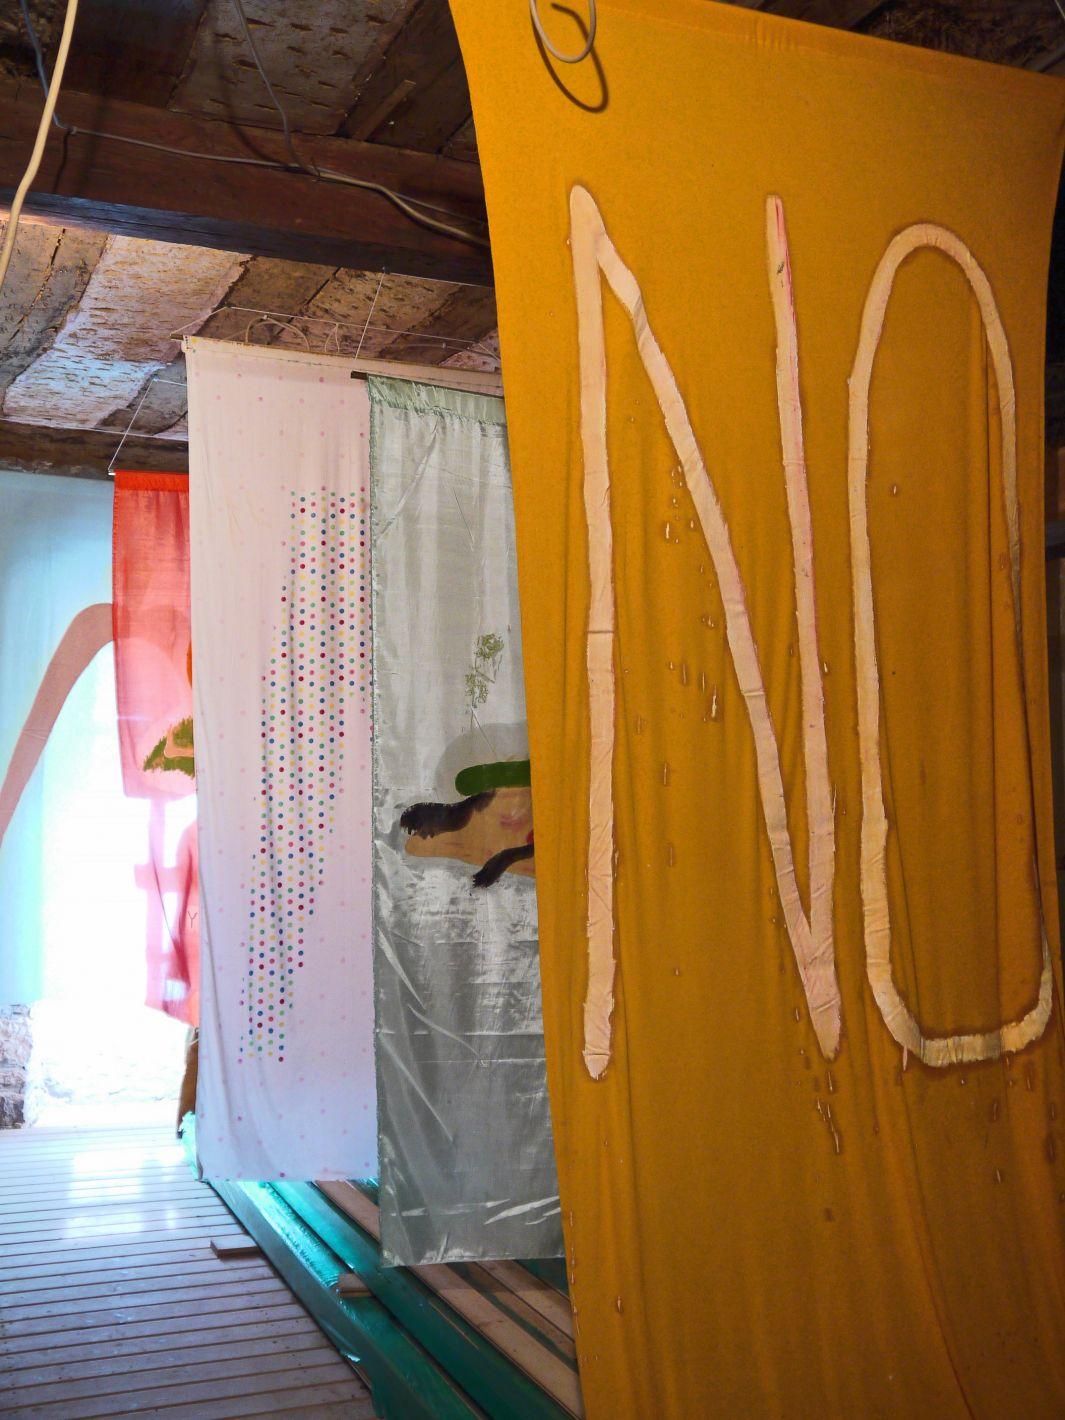 Better than your neighbour! | Christian Jankowski, Florian Meisenberg, Nicole Morris, Felix Oehmann, Laura Schawelka, Stuart Semple und Matthias Tharang | 29.03. — 28.05.2014